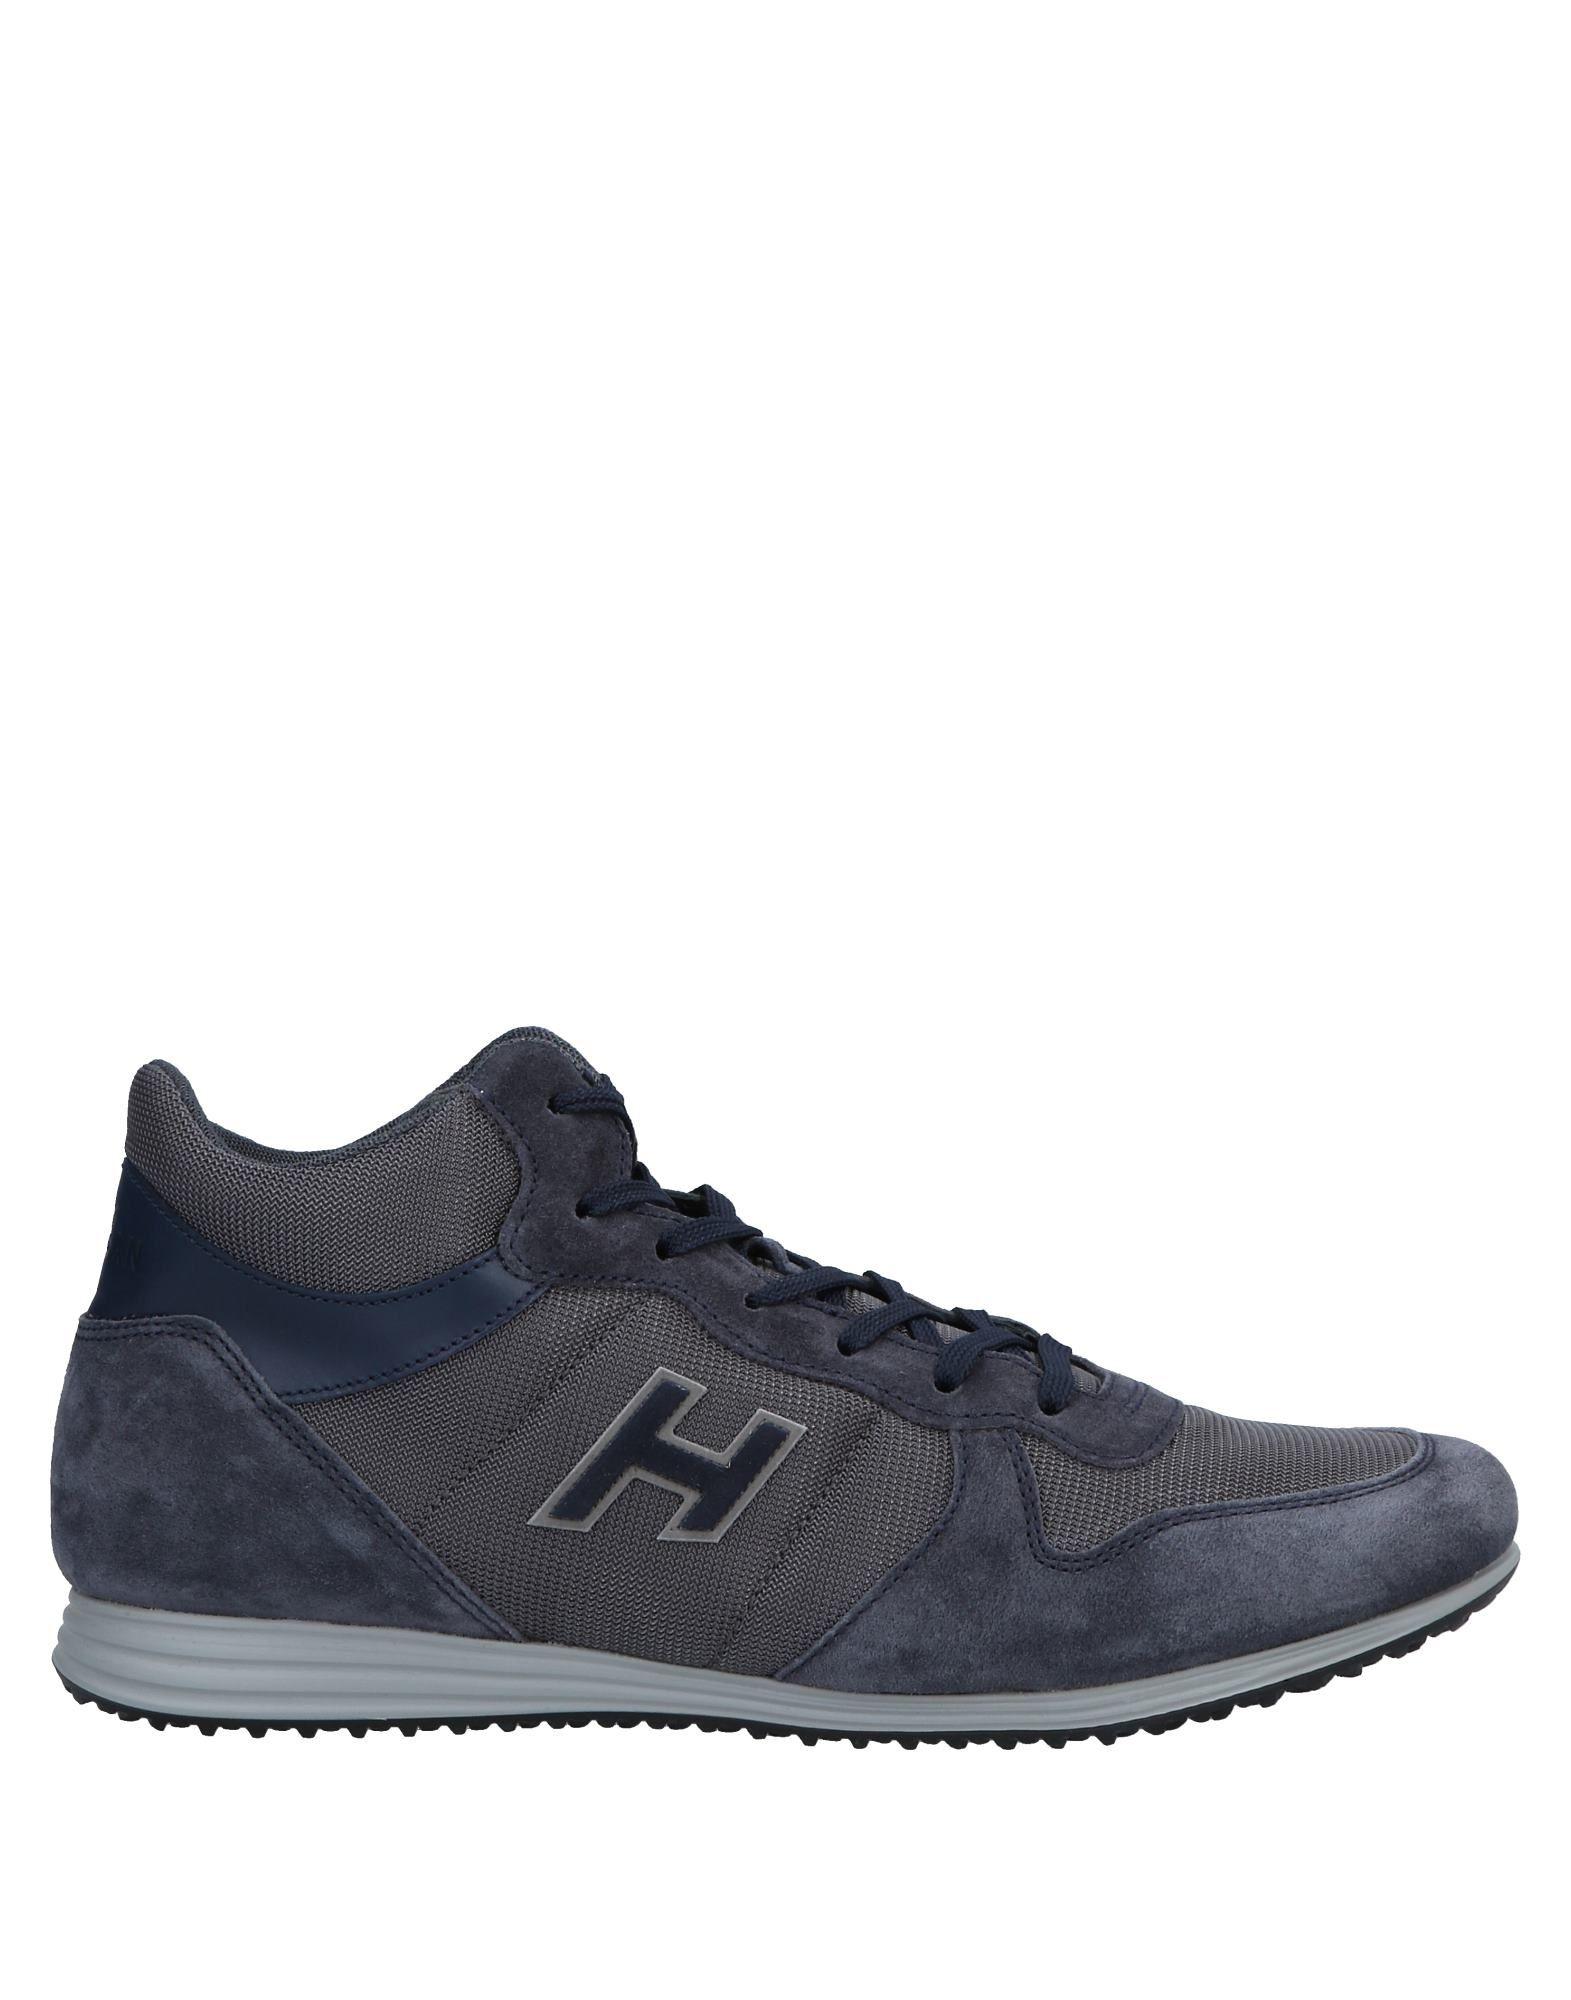 Hogan Sneakers Herren  11559685BE Gute Qualität beliebte Schuhe